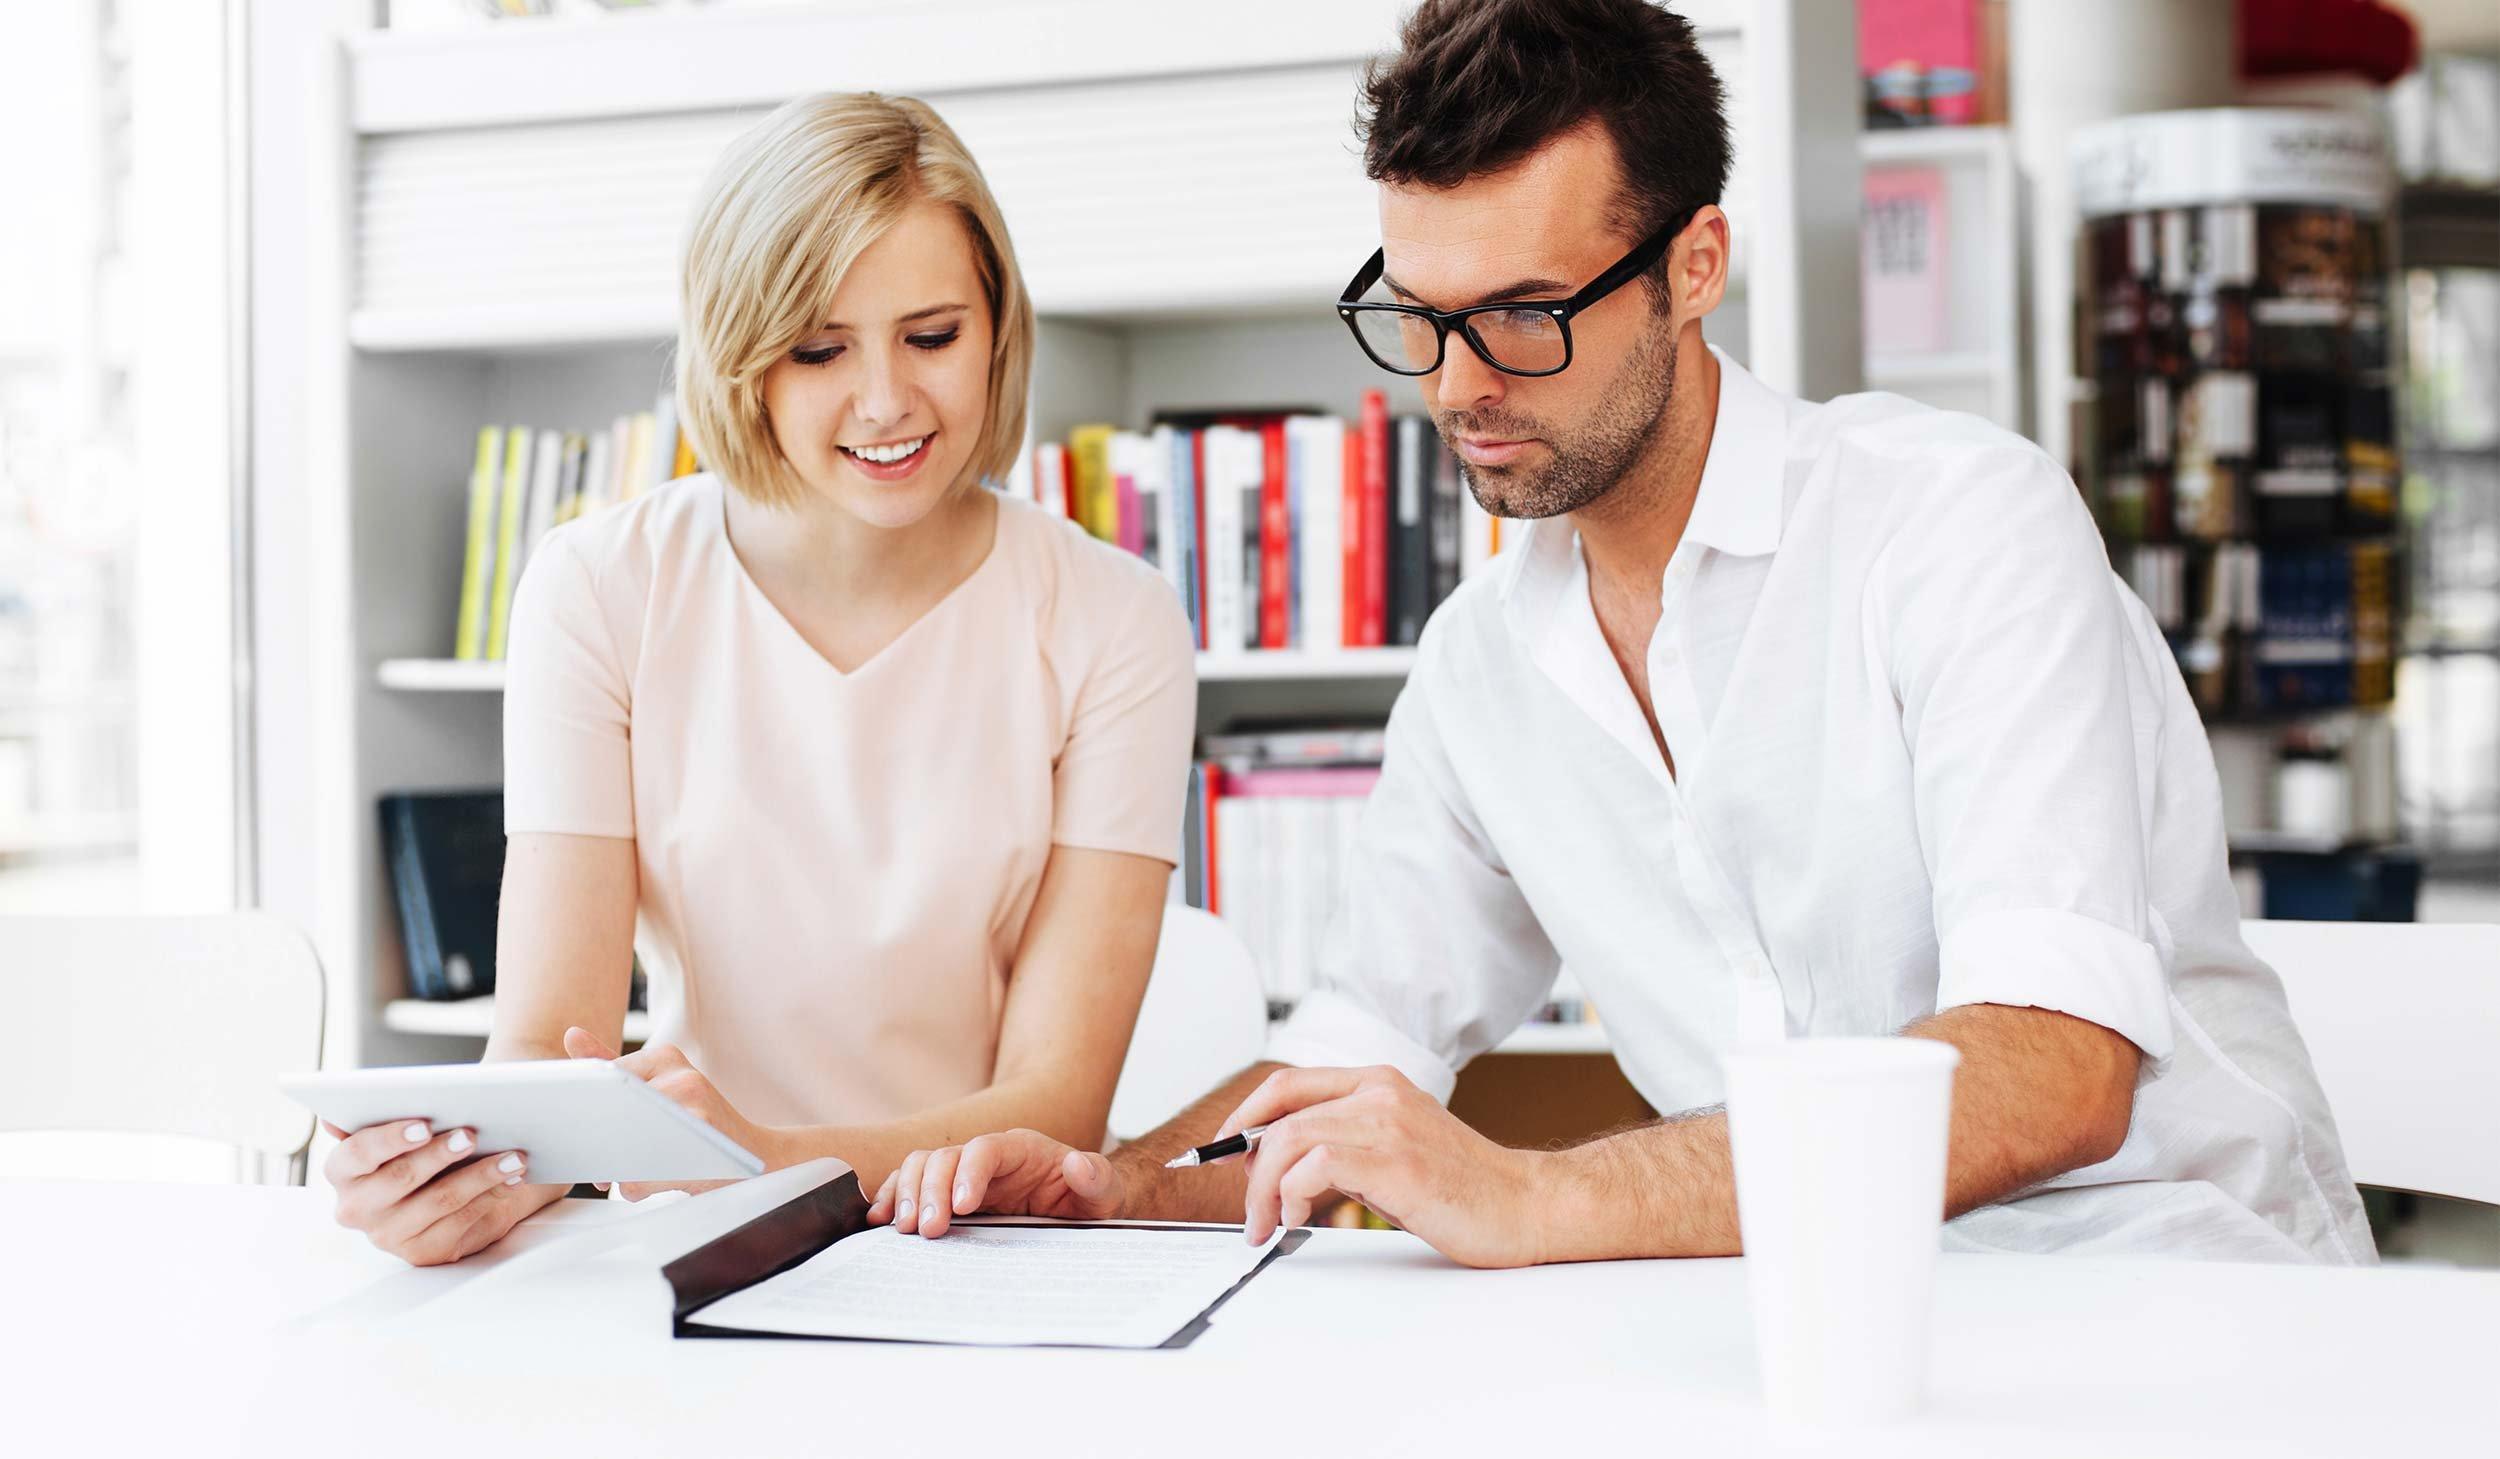 Employee-Onboarding-Register-Your-Interest-Background-Image-flipped.jpg